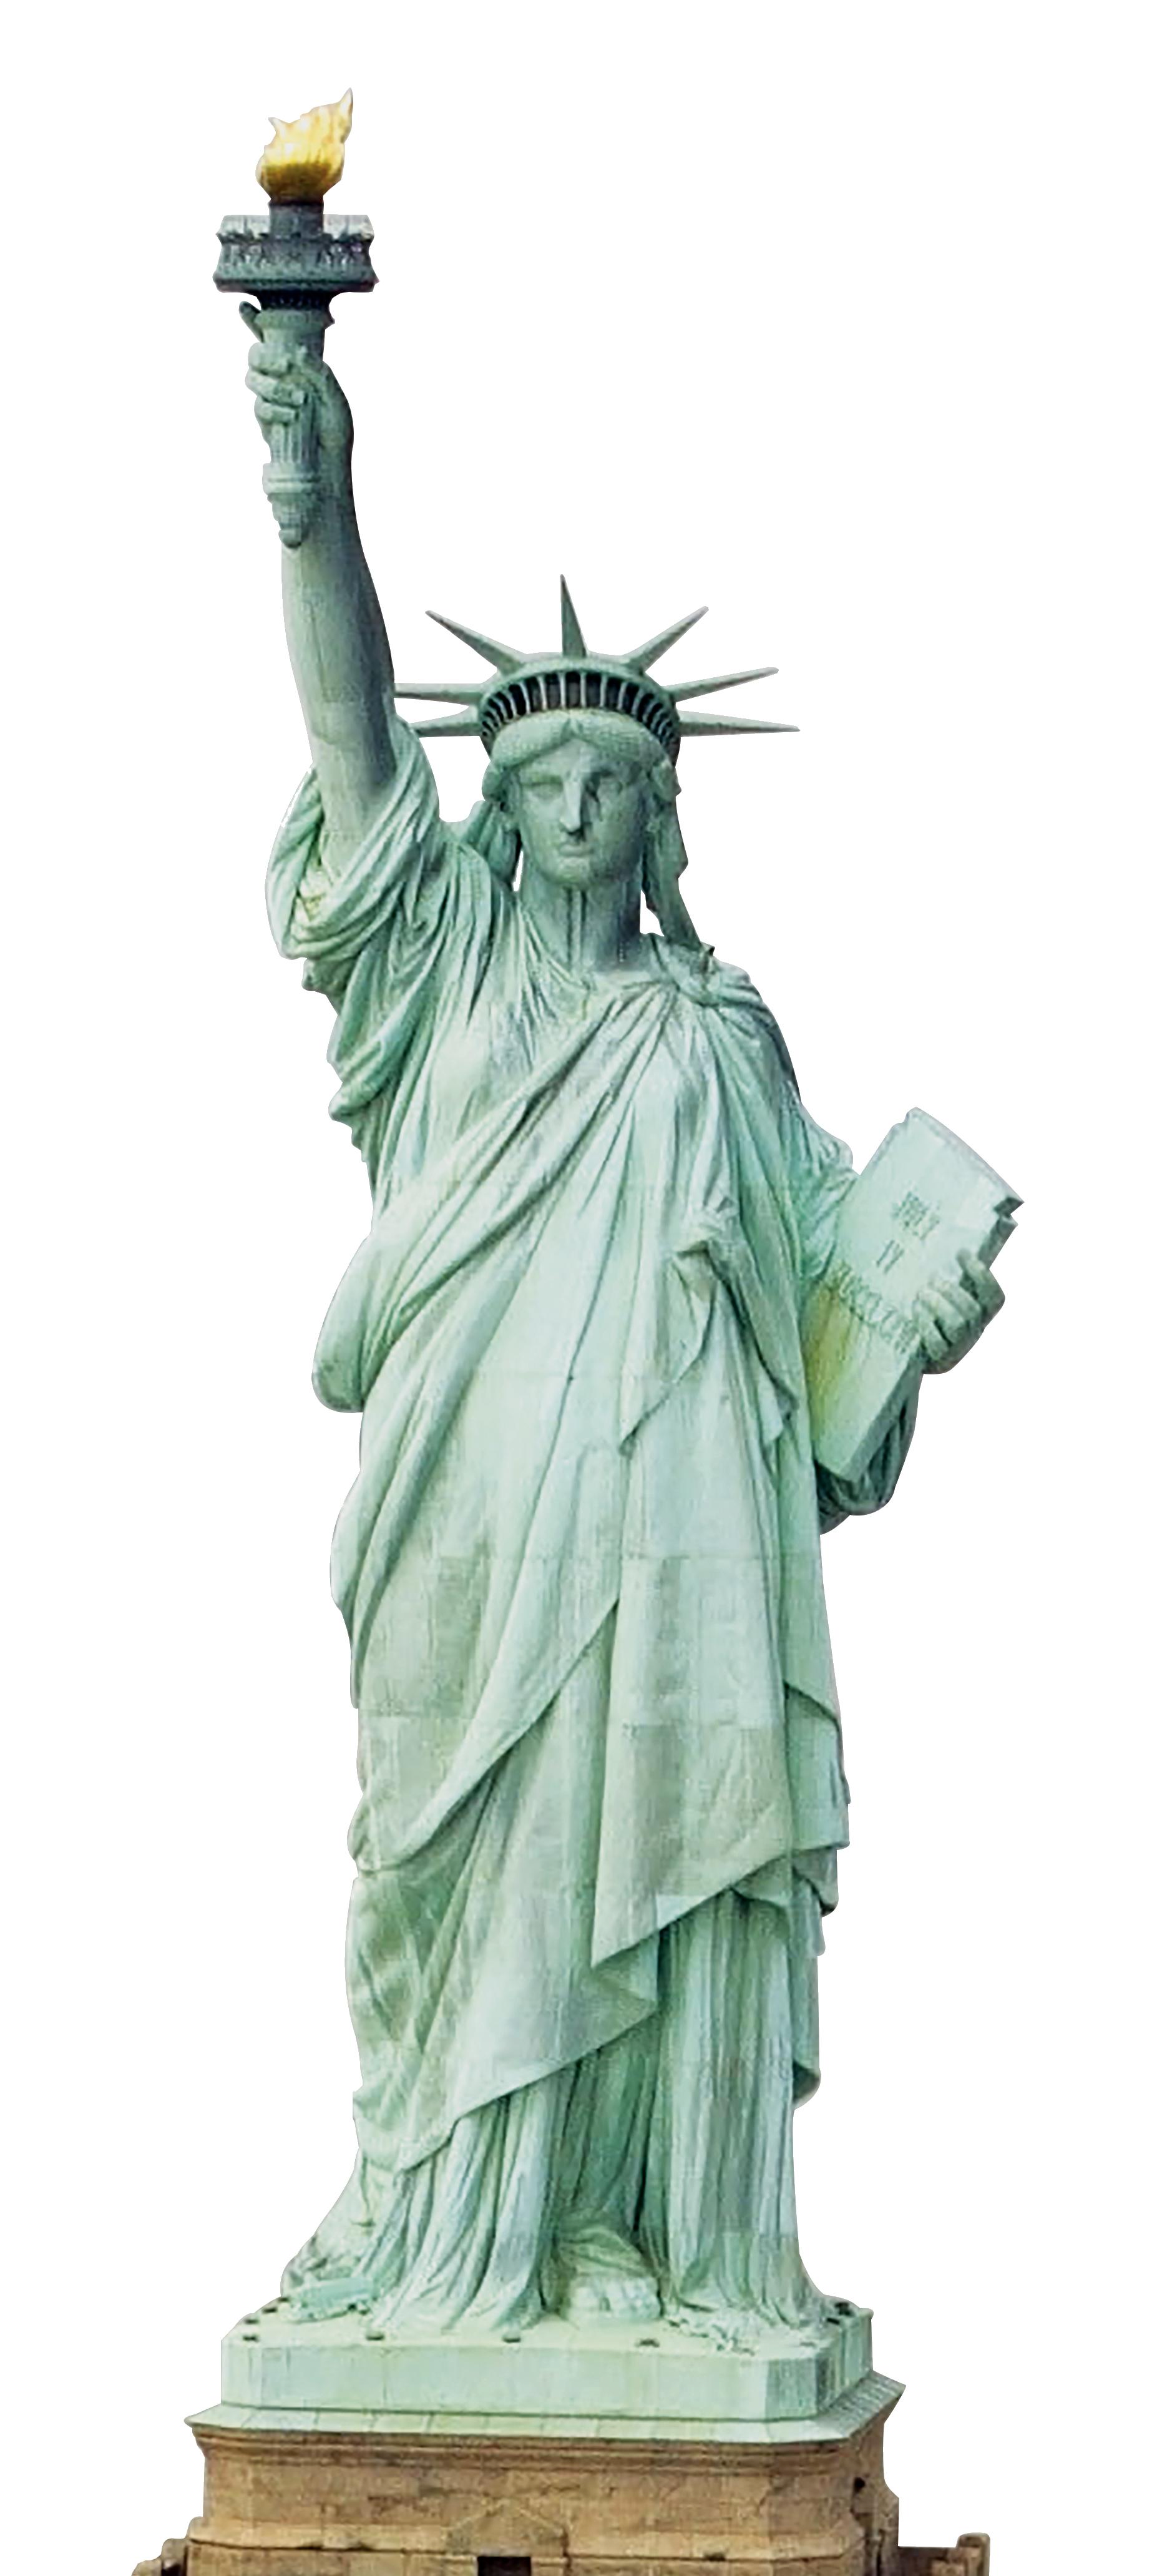 Statue Of Liberty clipart lady liberty #6